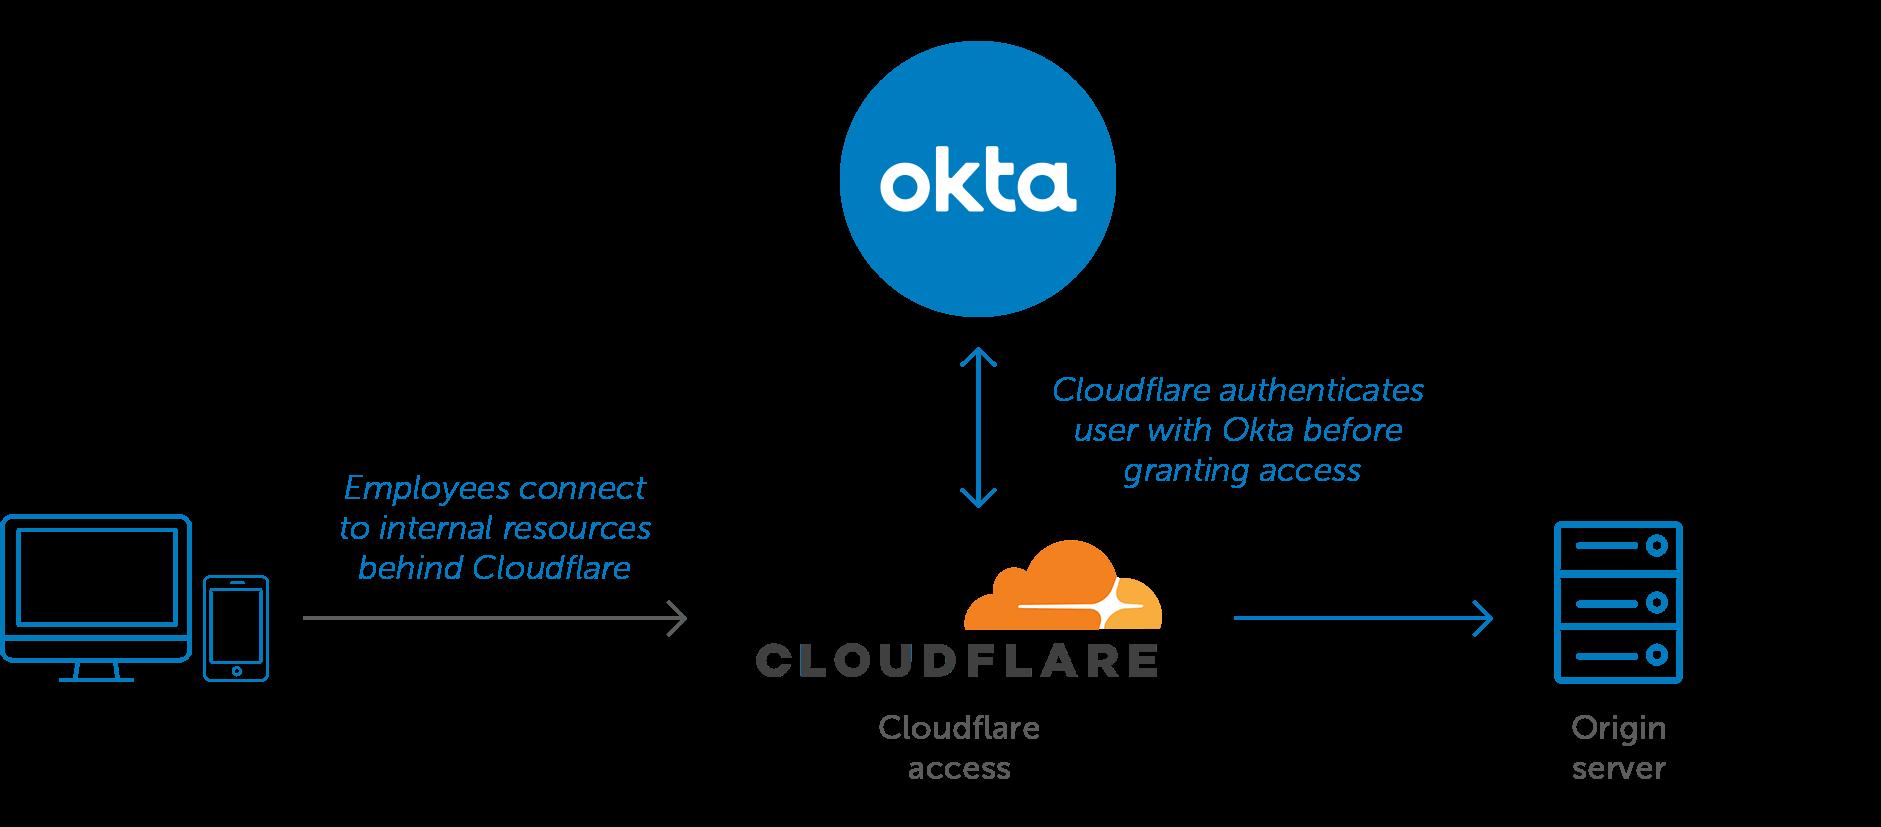 Okta Cloudflare Integration Diagram  1